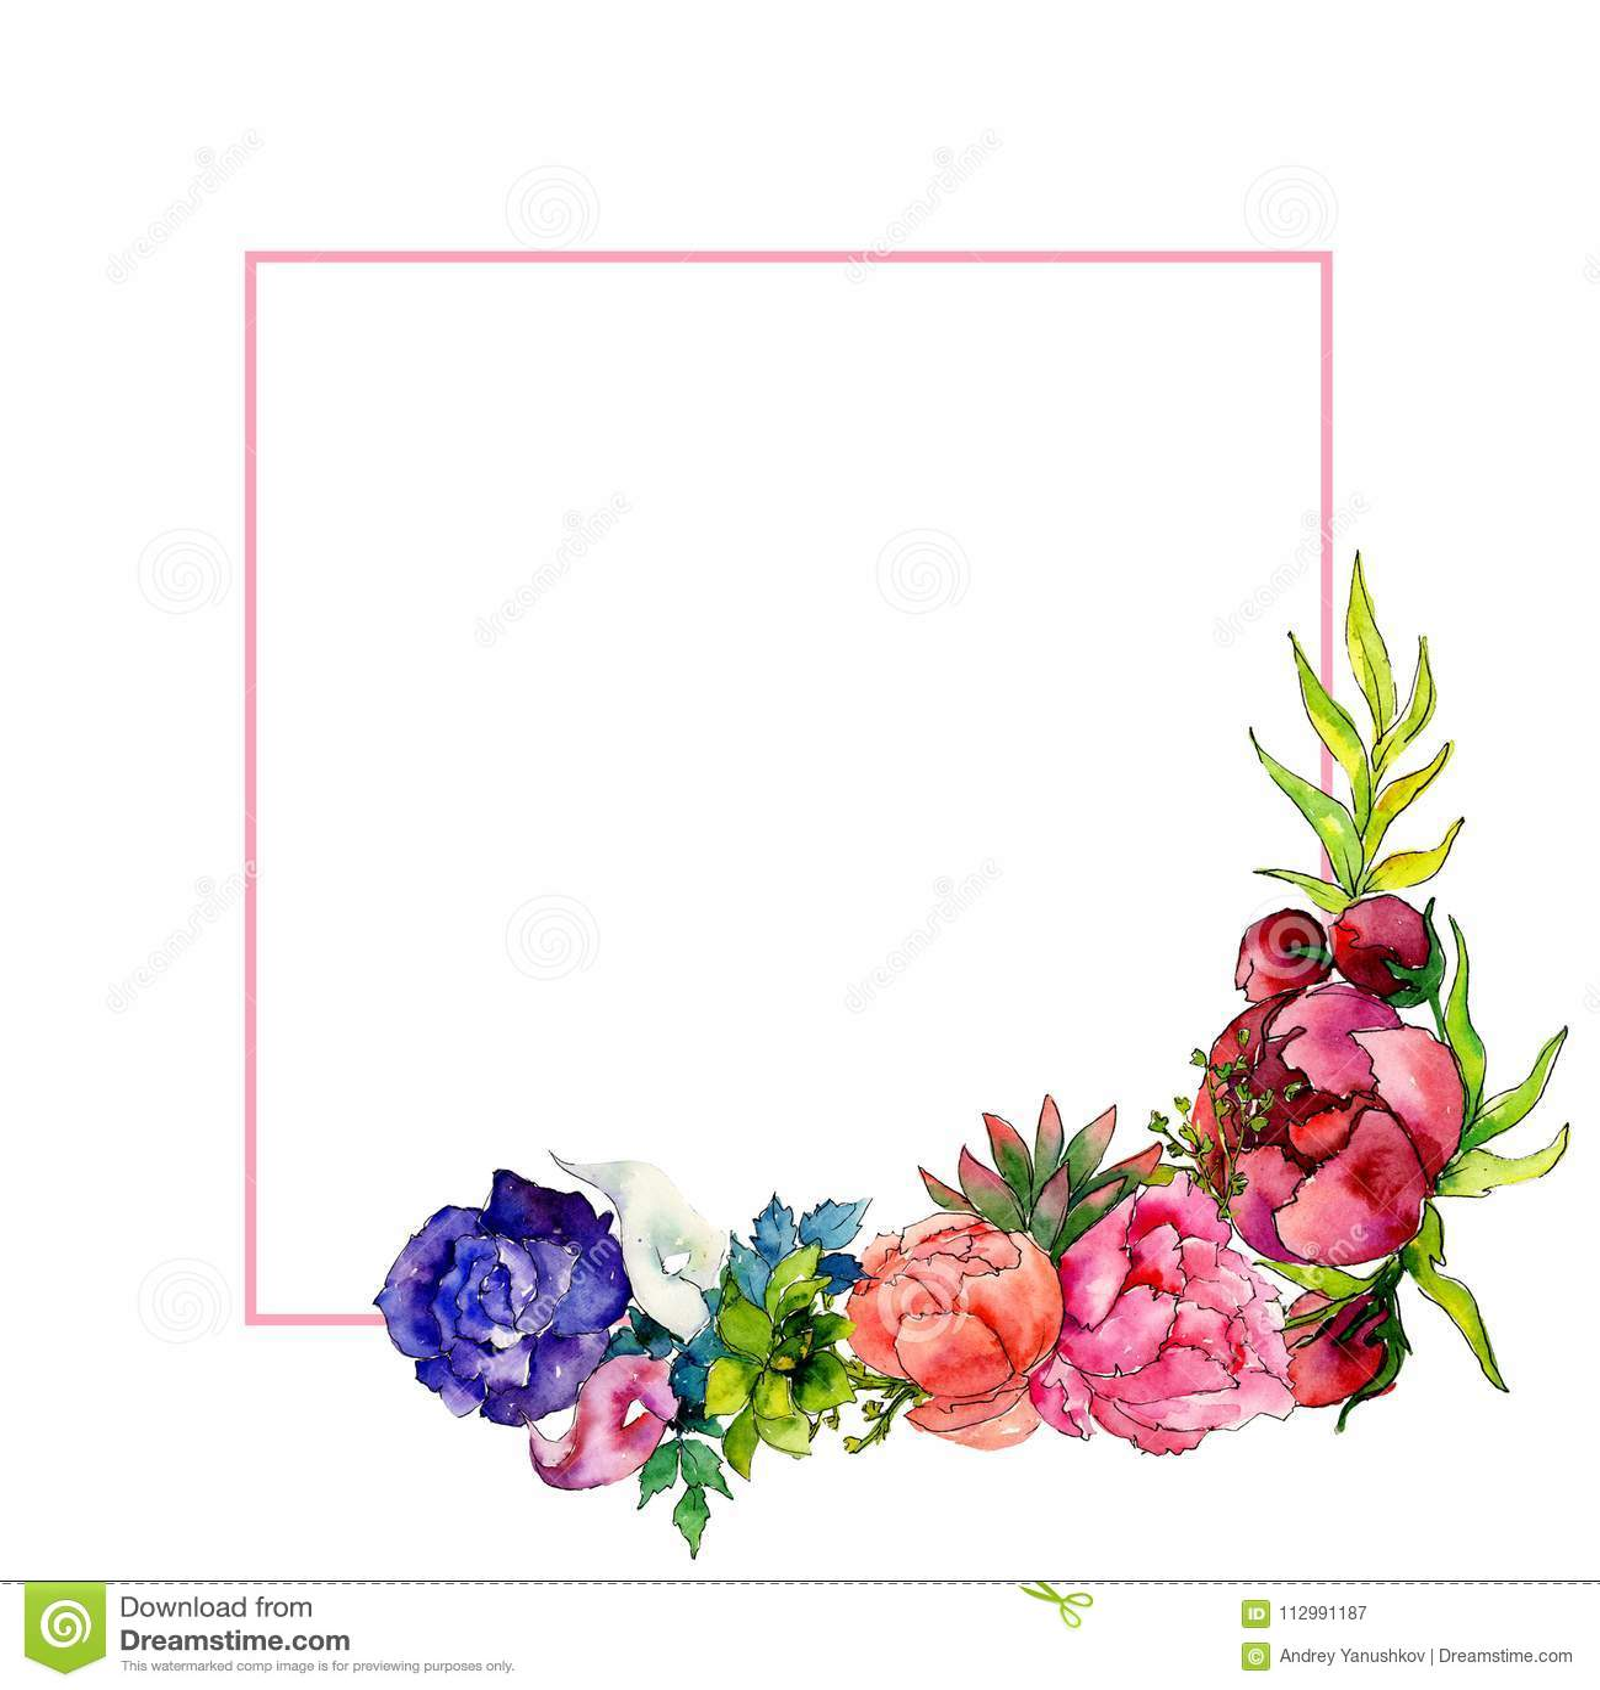 Bouquet wildflower flower frame in a watercolor style.